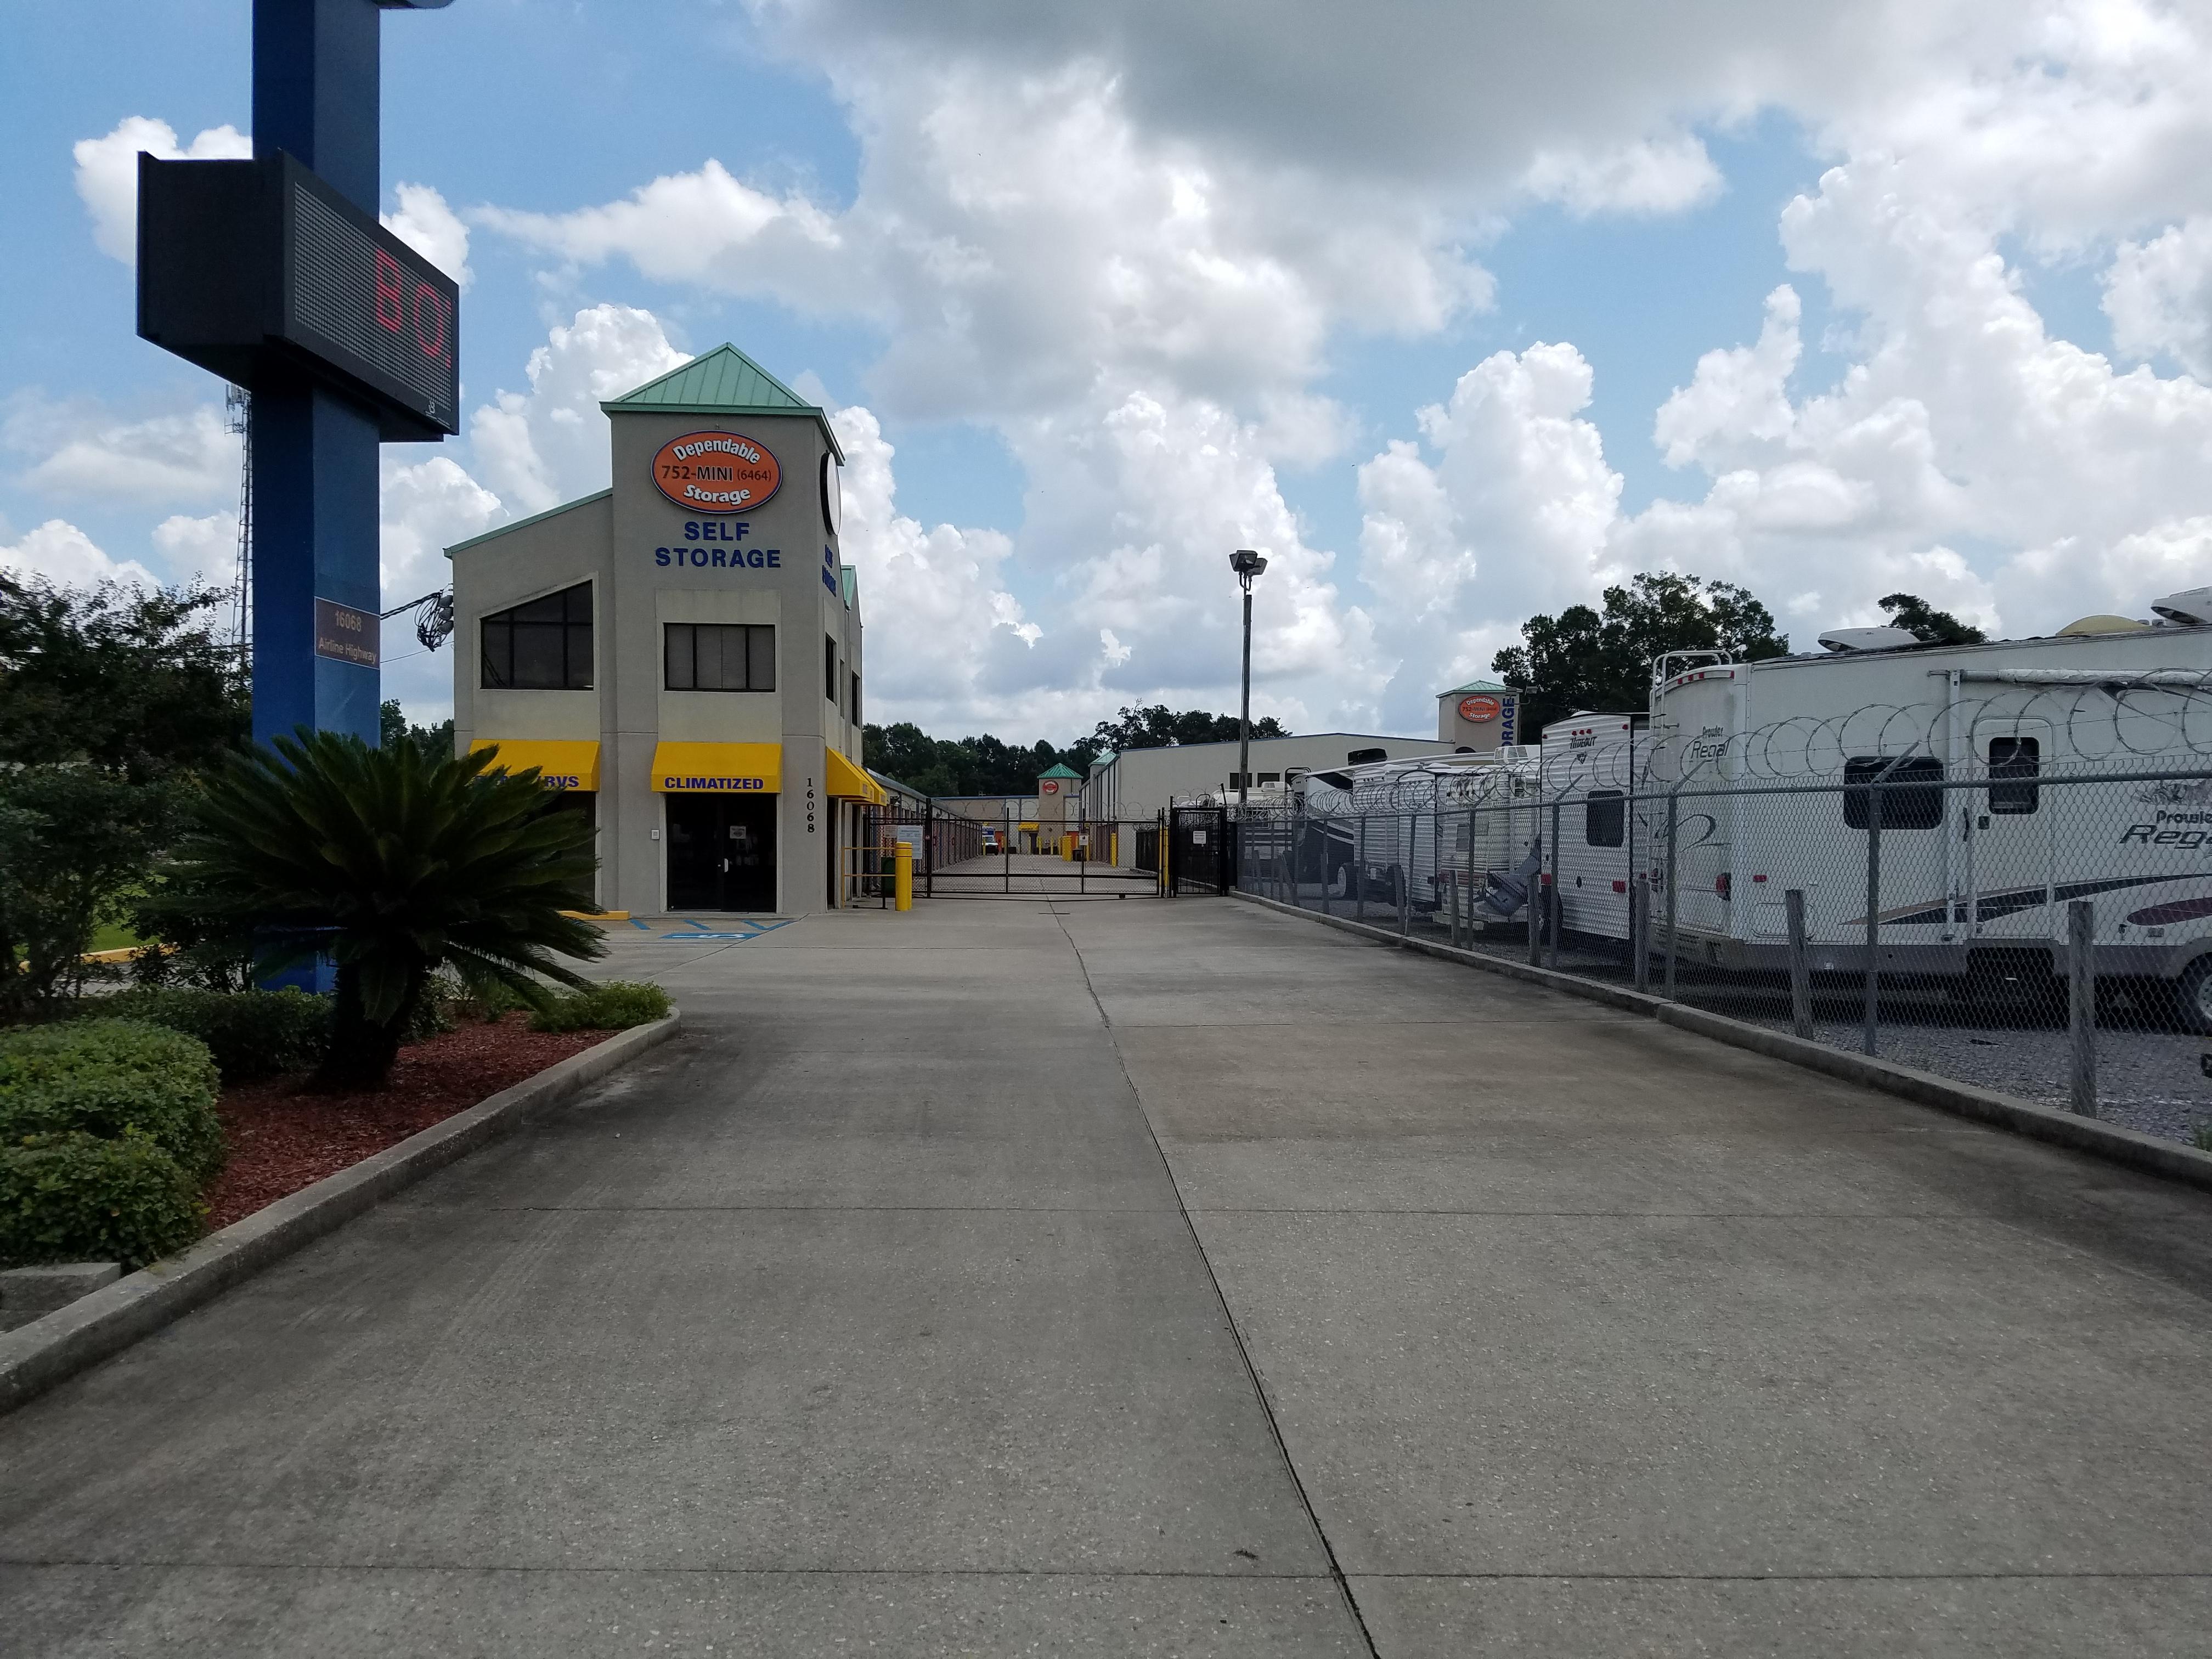 rv, boat parking available 24-hours prairieville, la